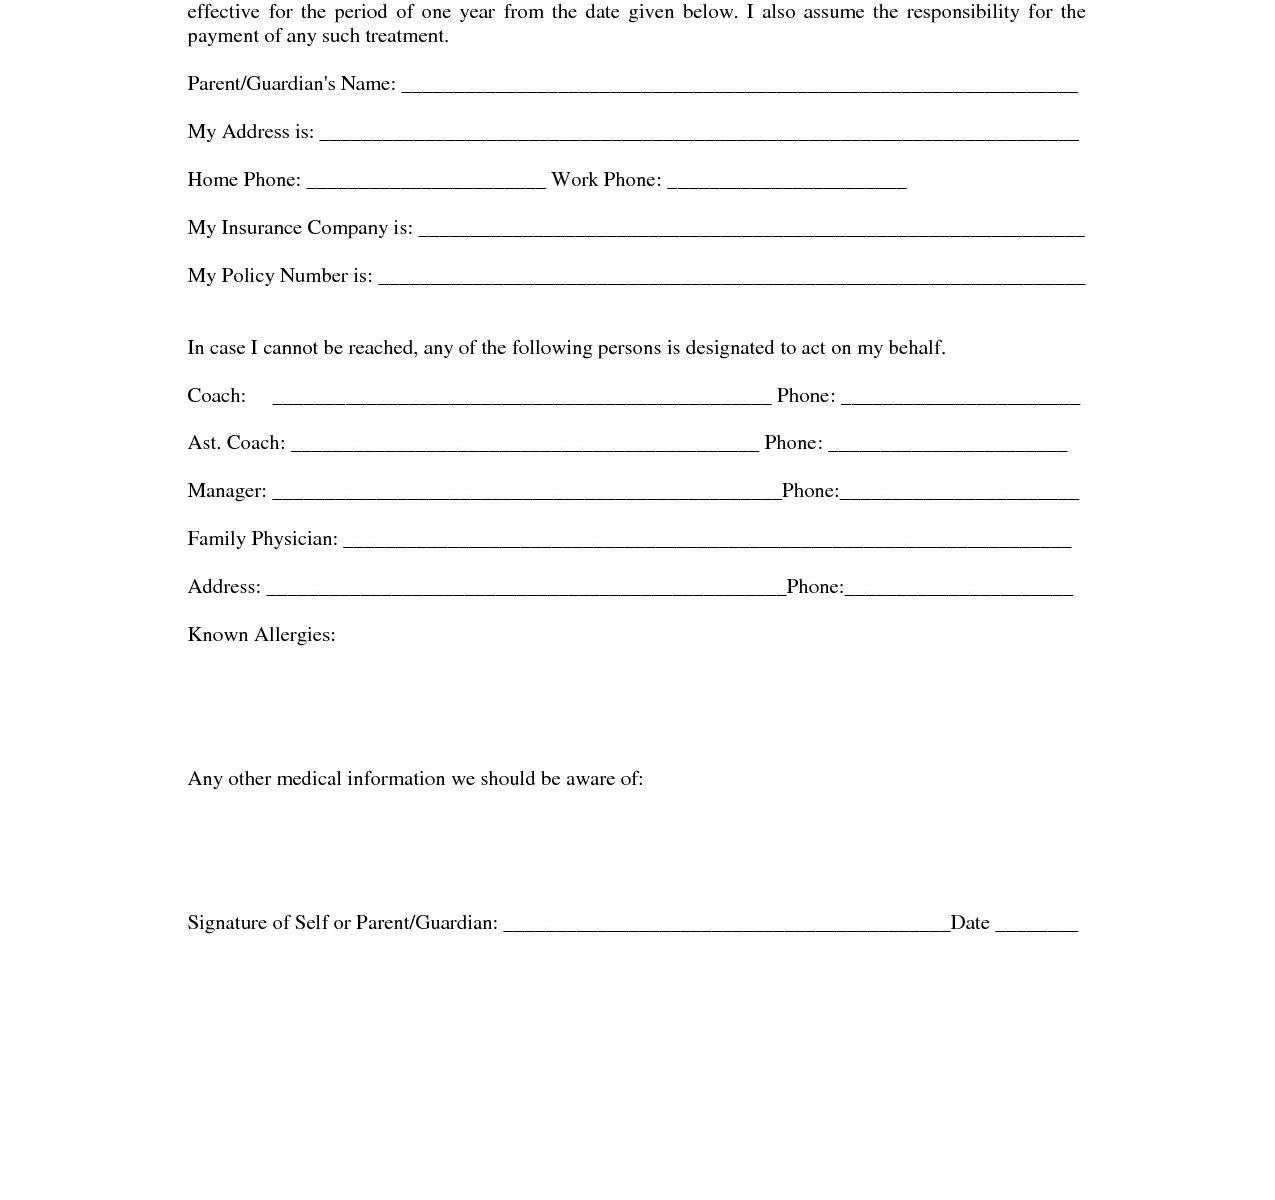 Hipaa Authorization Form Template